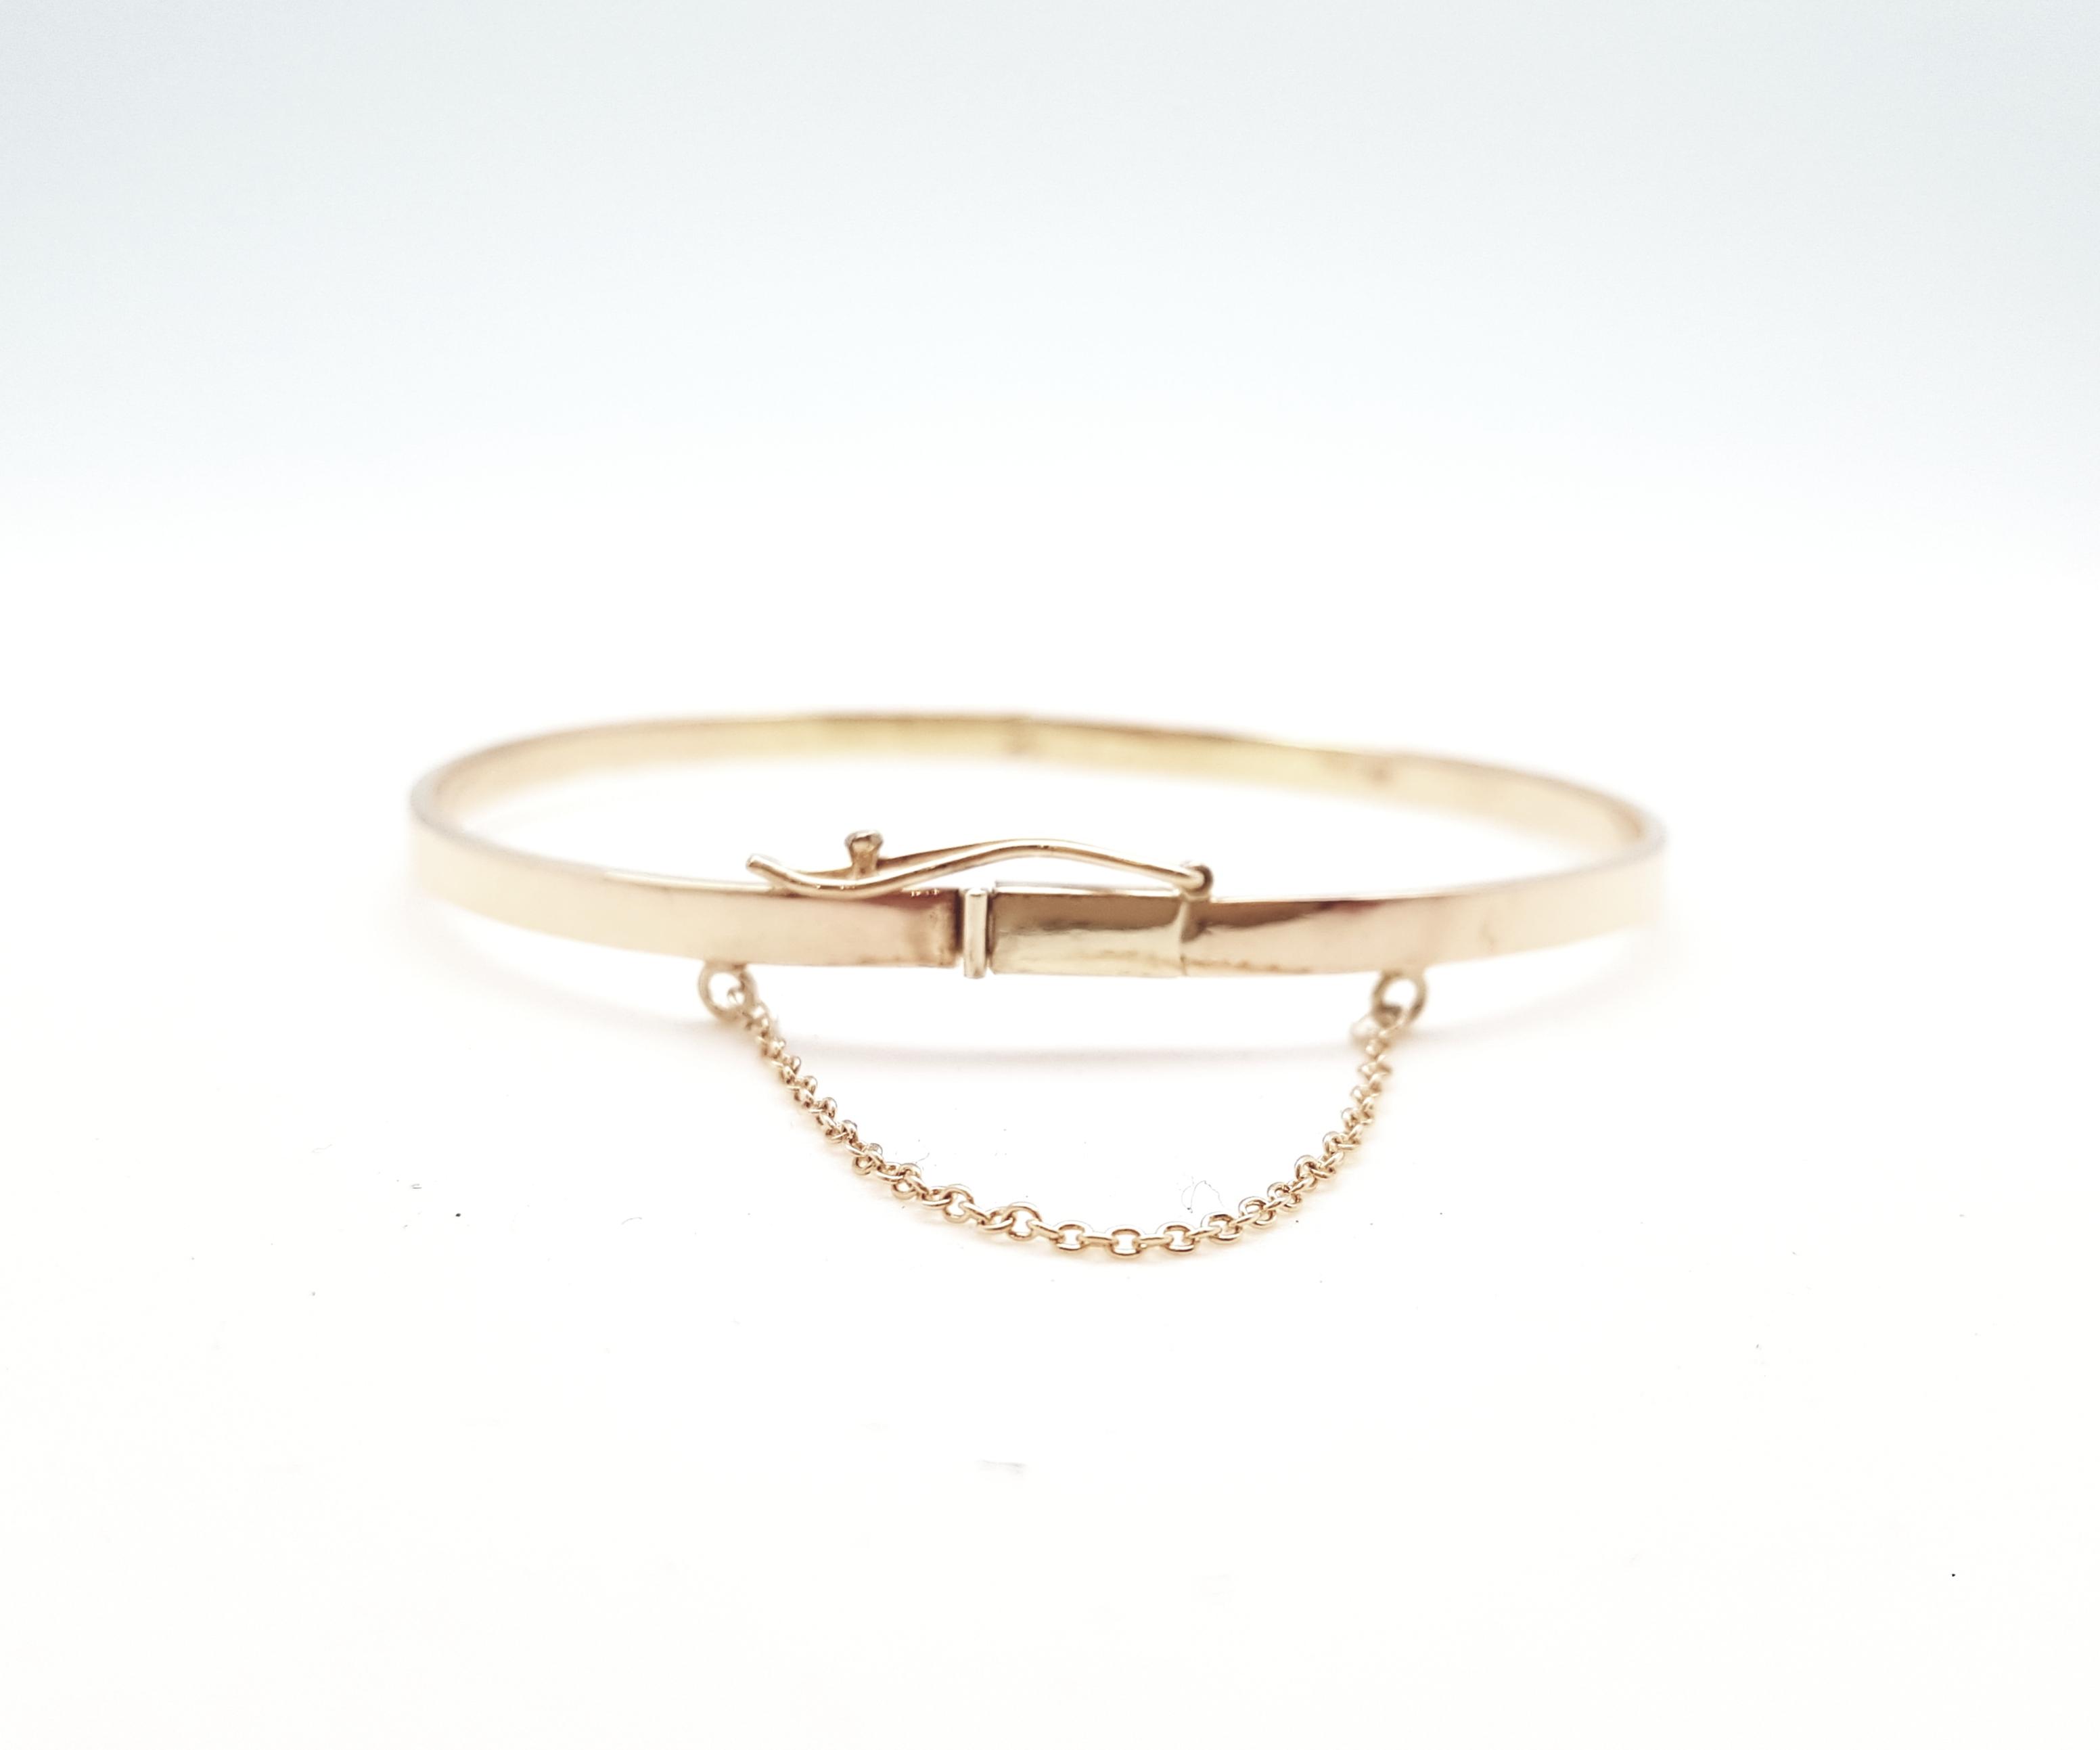 Transformation d'ancien or en bracelet rigide